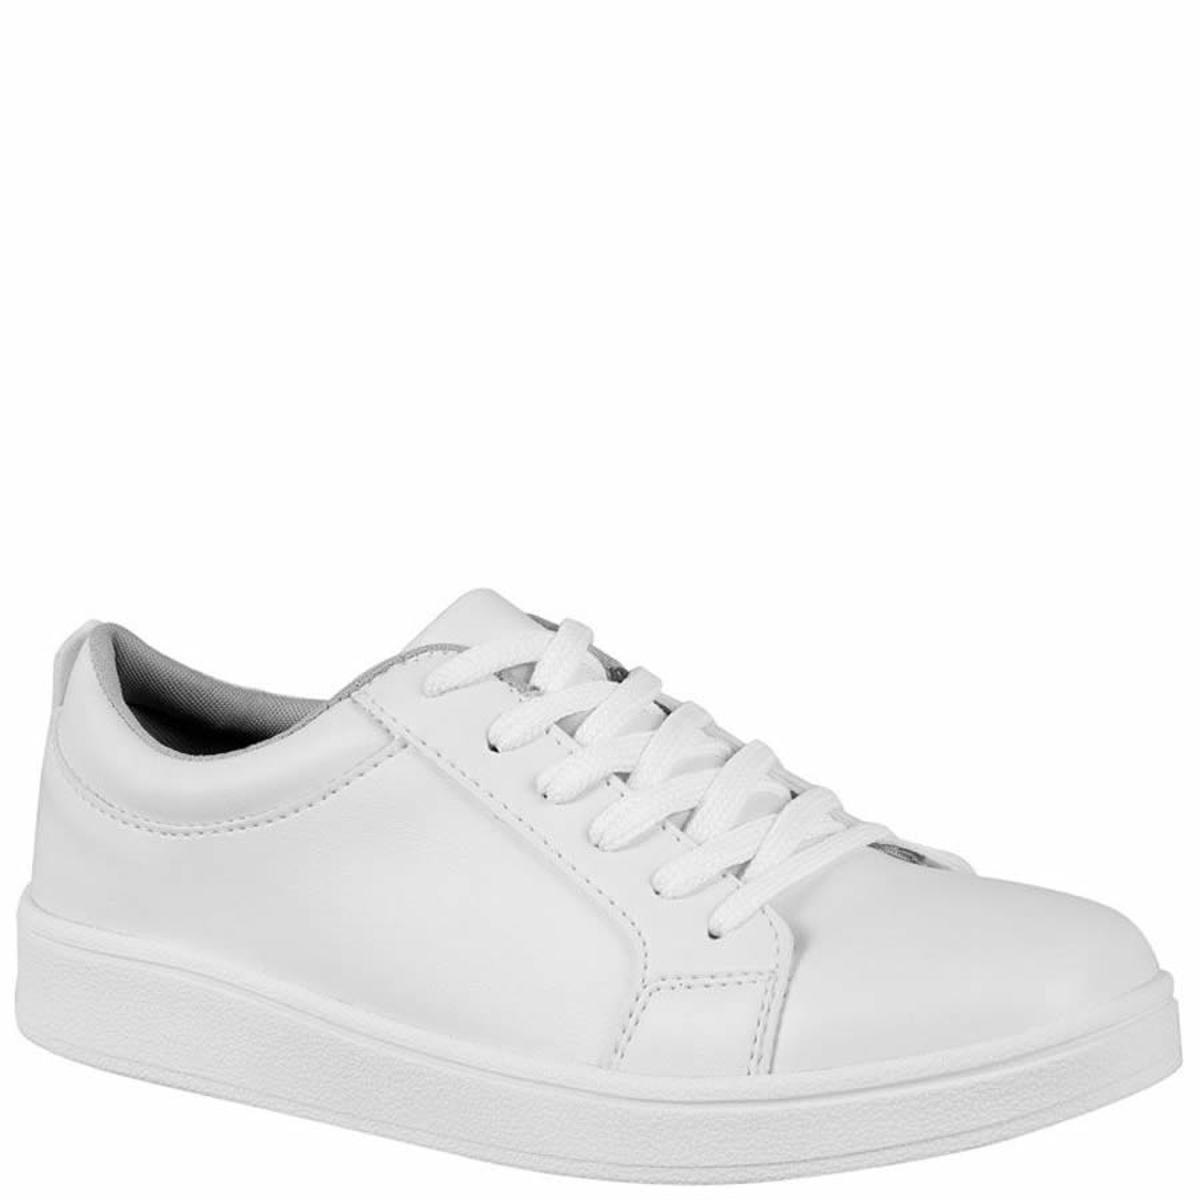 Tênis Shoes Branco Casual Top Top Franca Tênis r1RCr4F